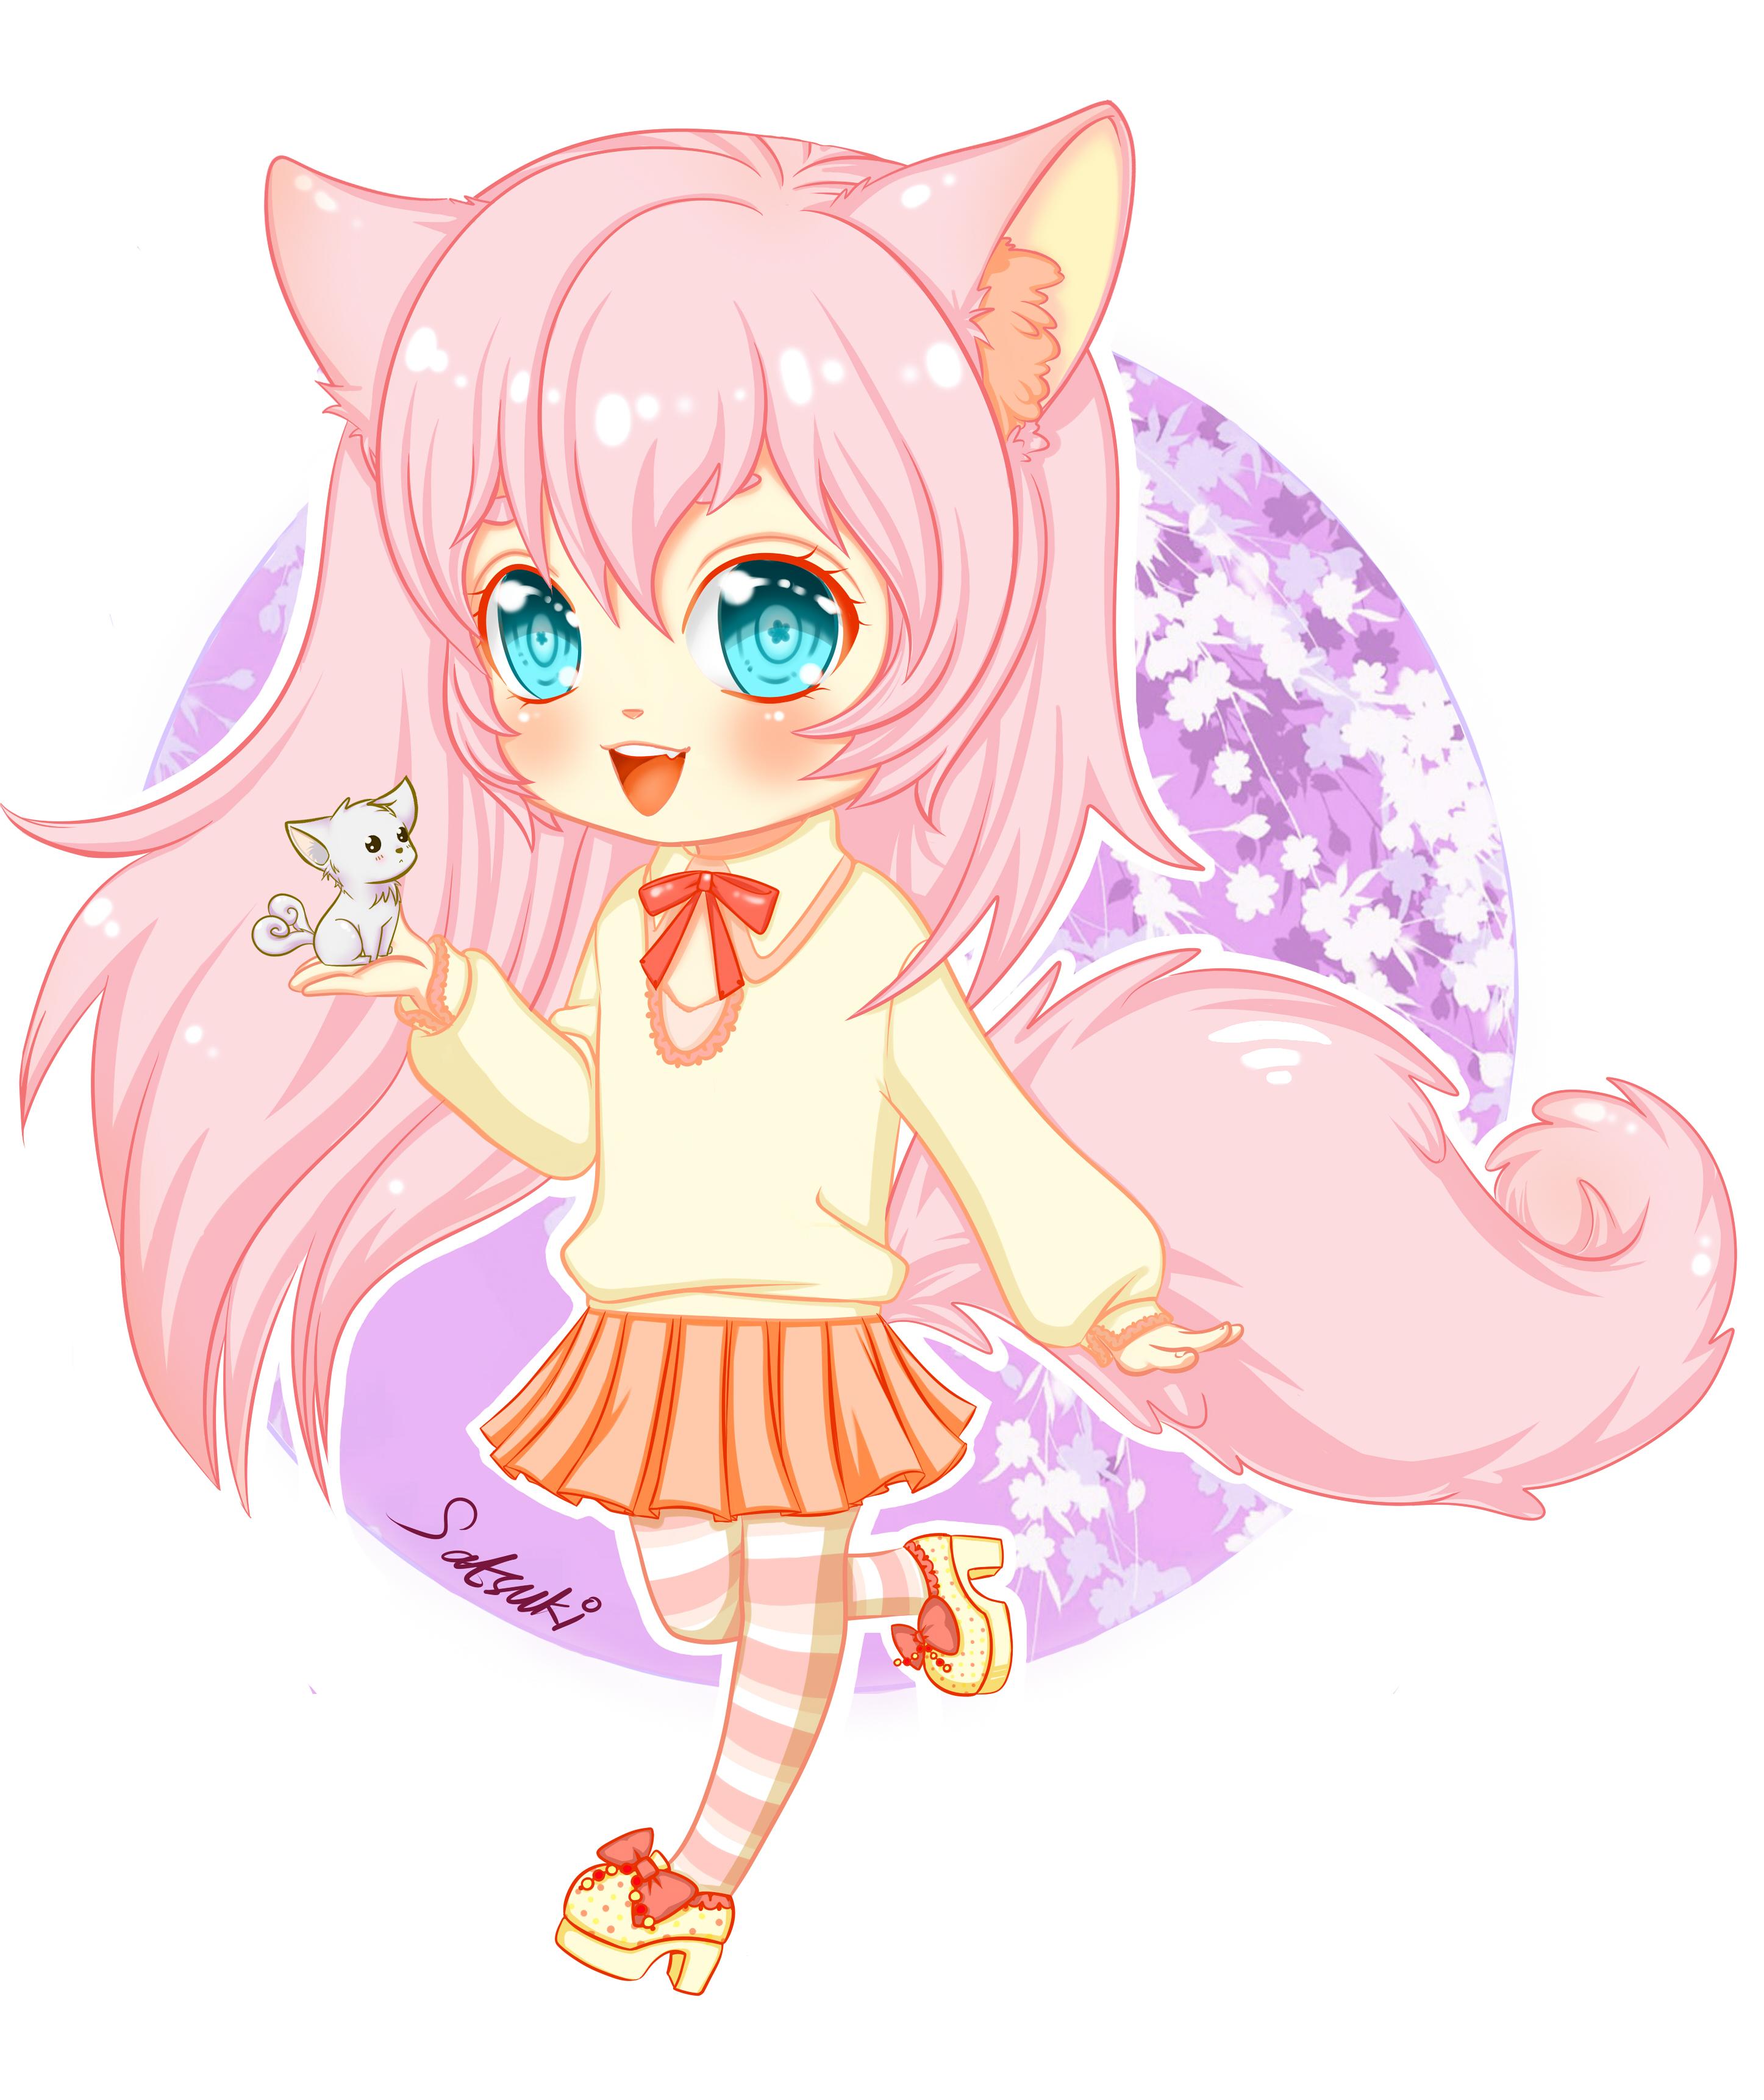 Chibi Fox Girl by satsuki10 on DeviantArt